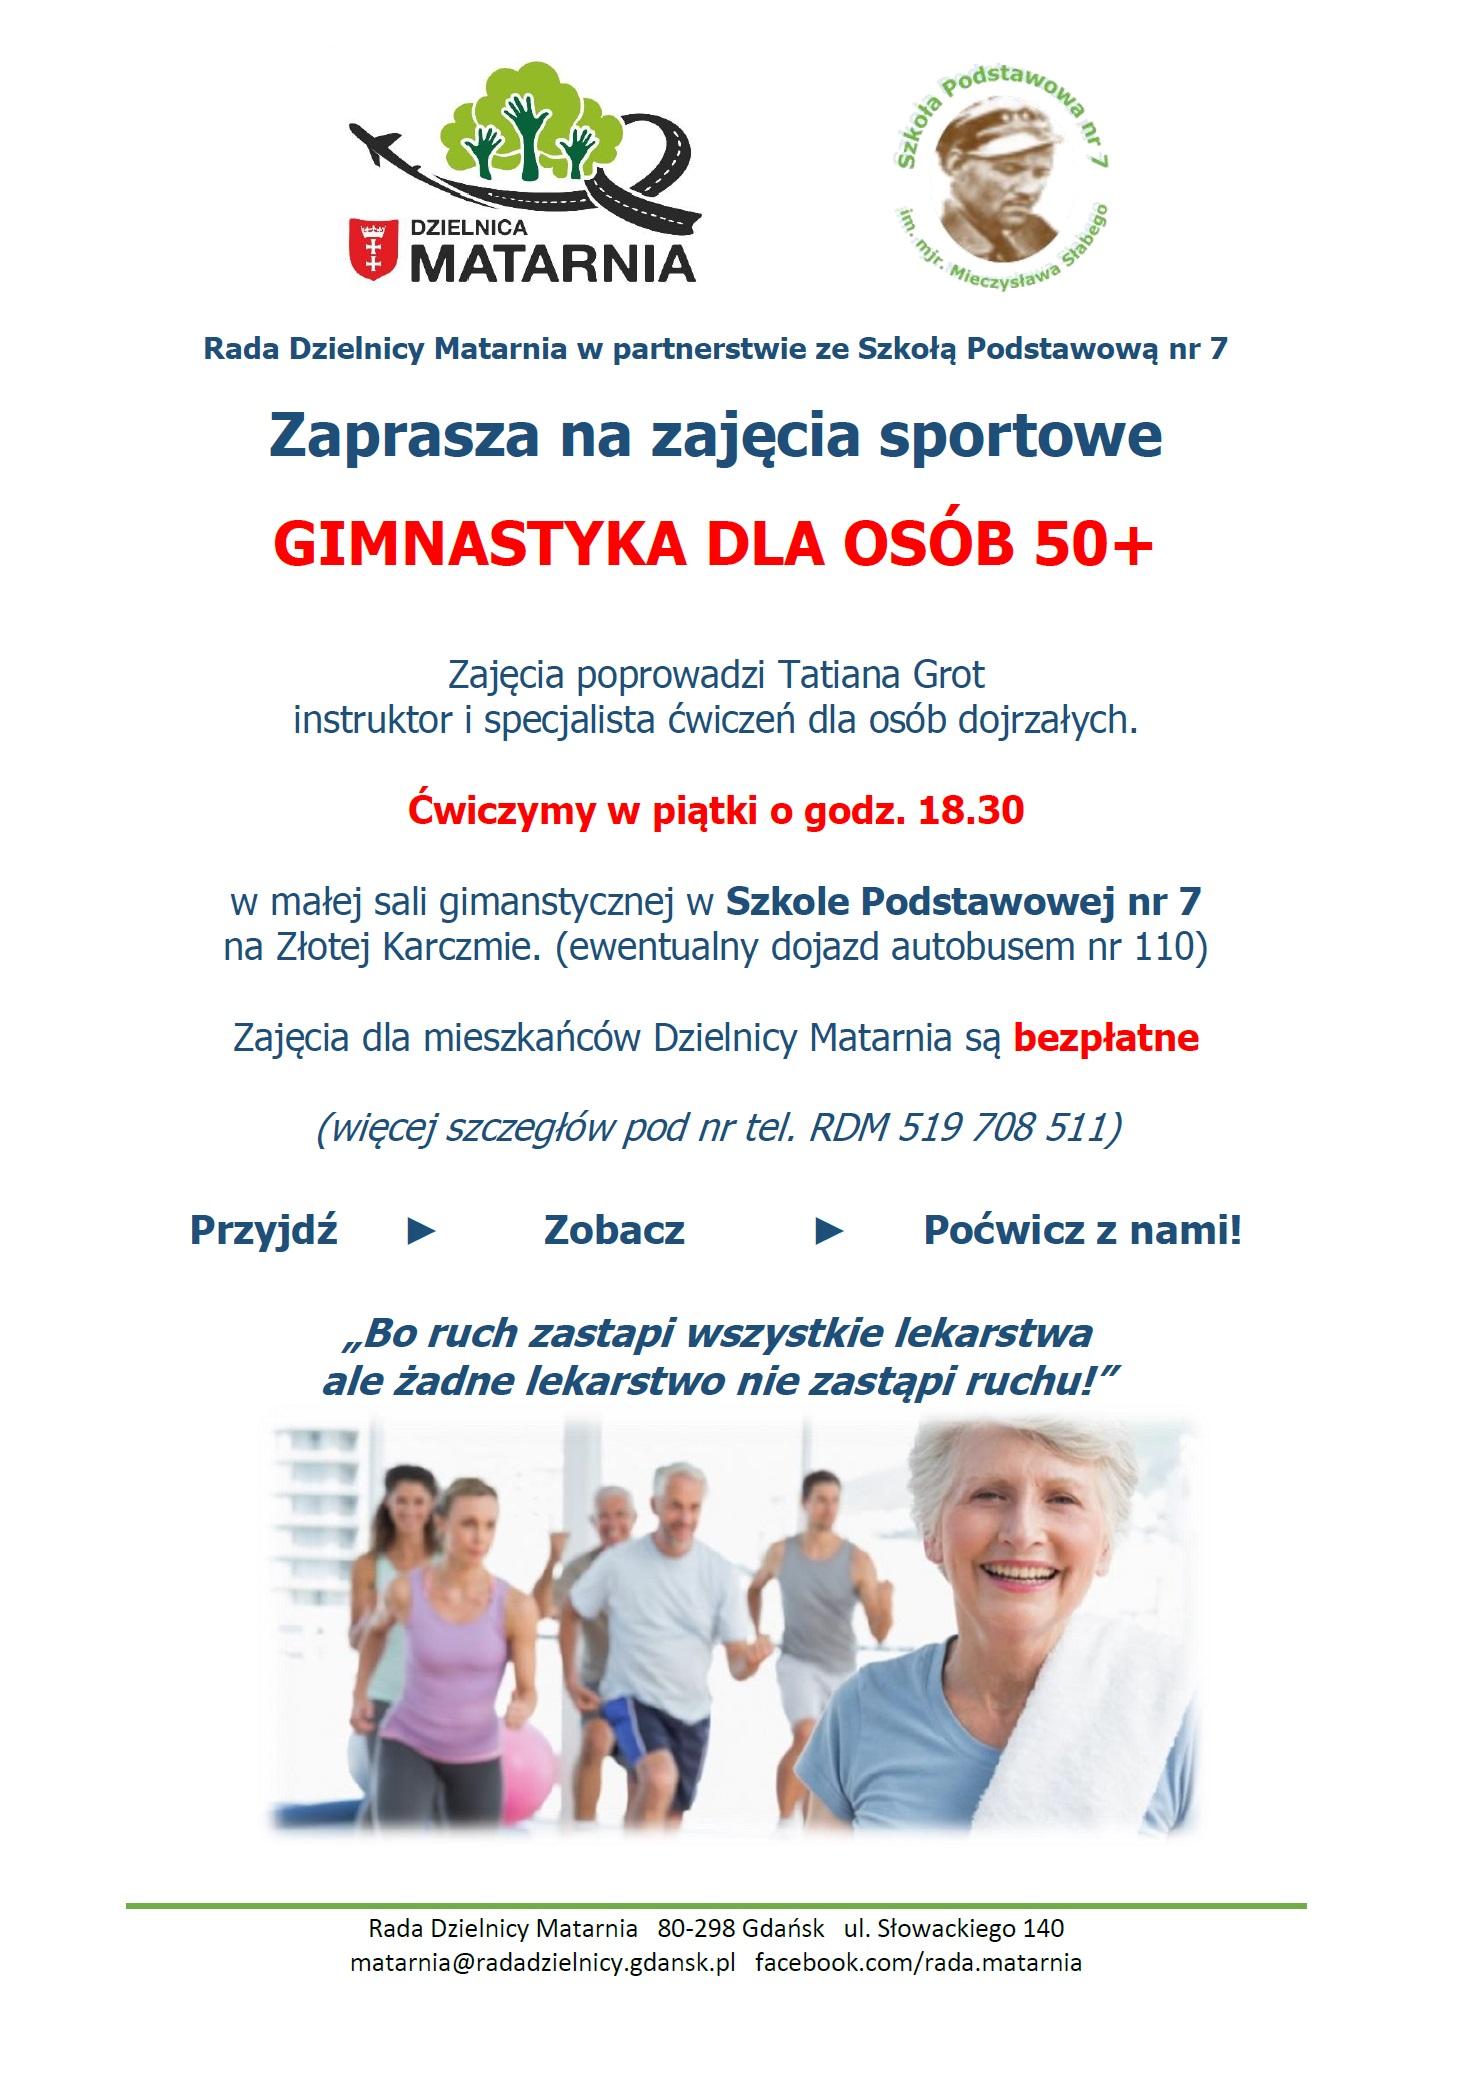 http://dzielnicamatarnia.pl/wp-content/uploads/2019/09/50plus.jpg